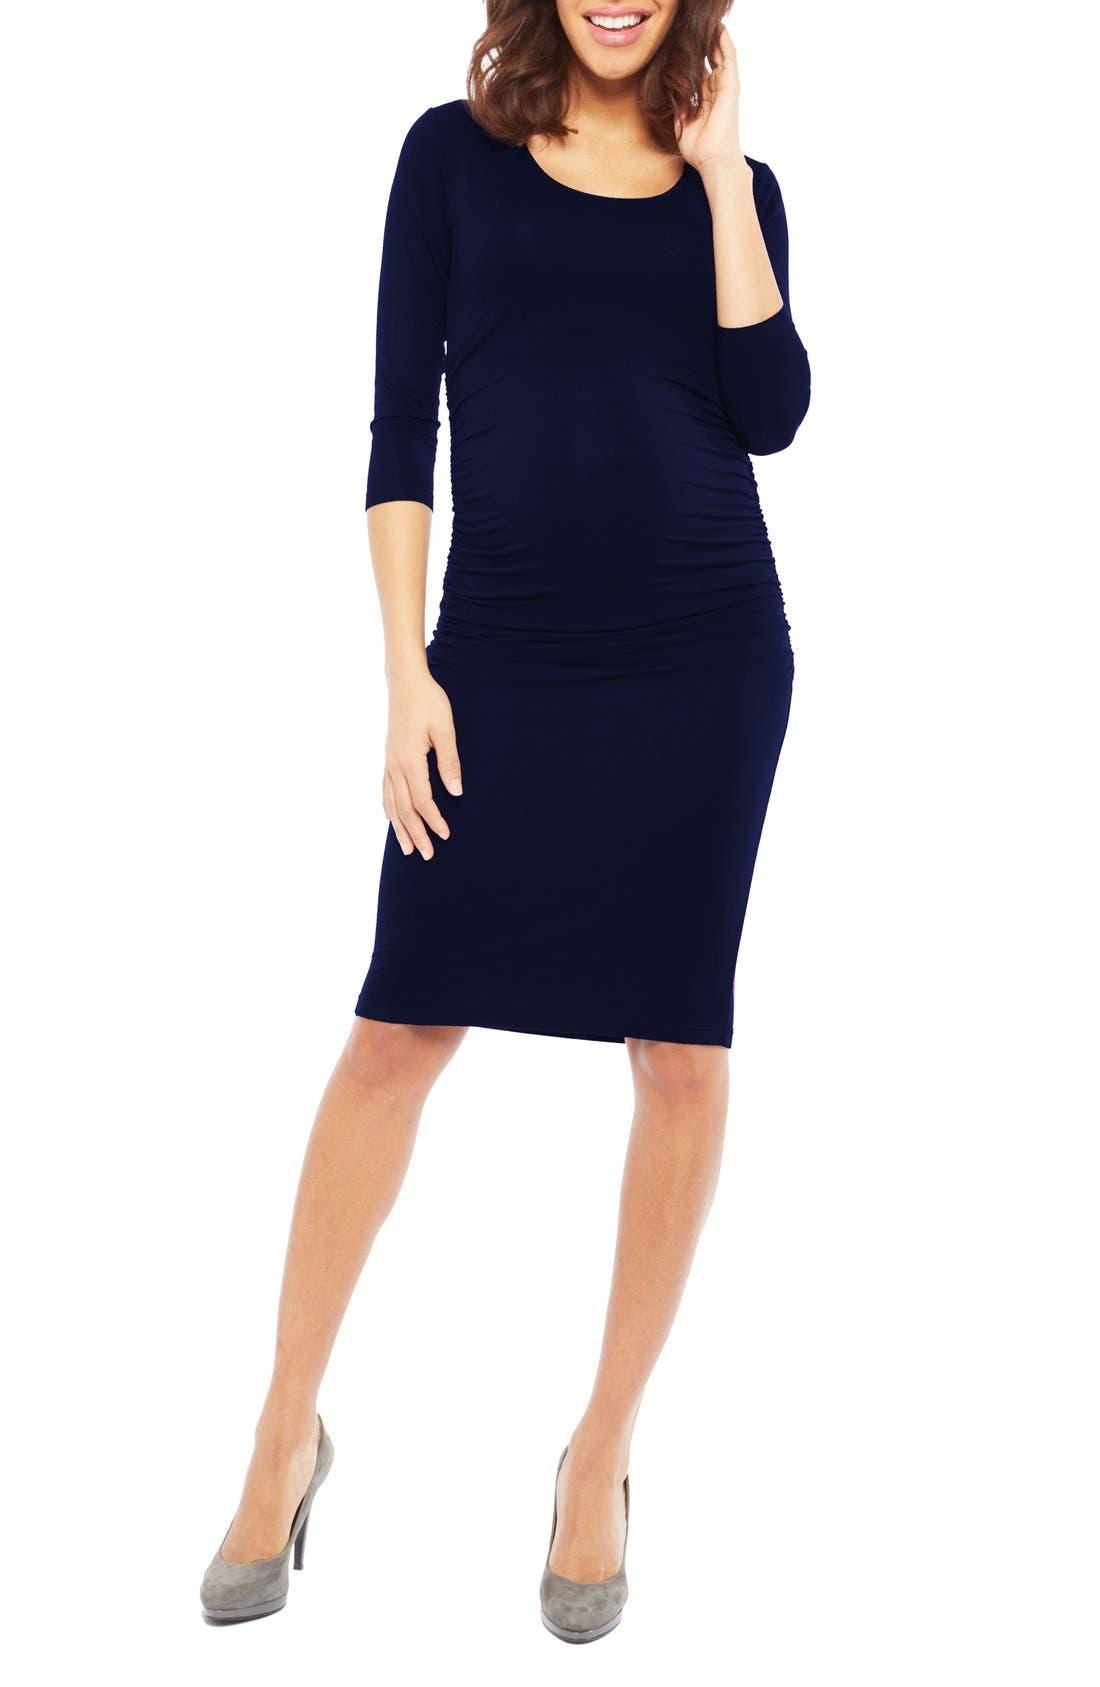 Main Image - Nom 'Ellie' Ruched Maternity Dress